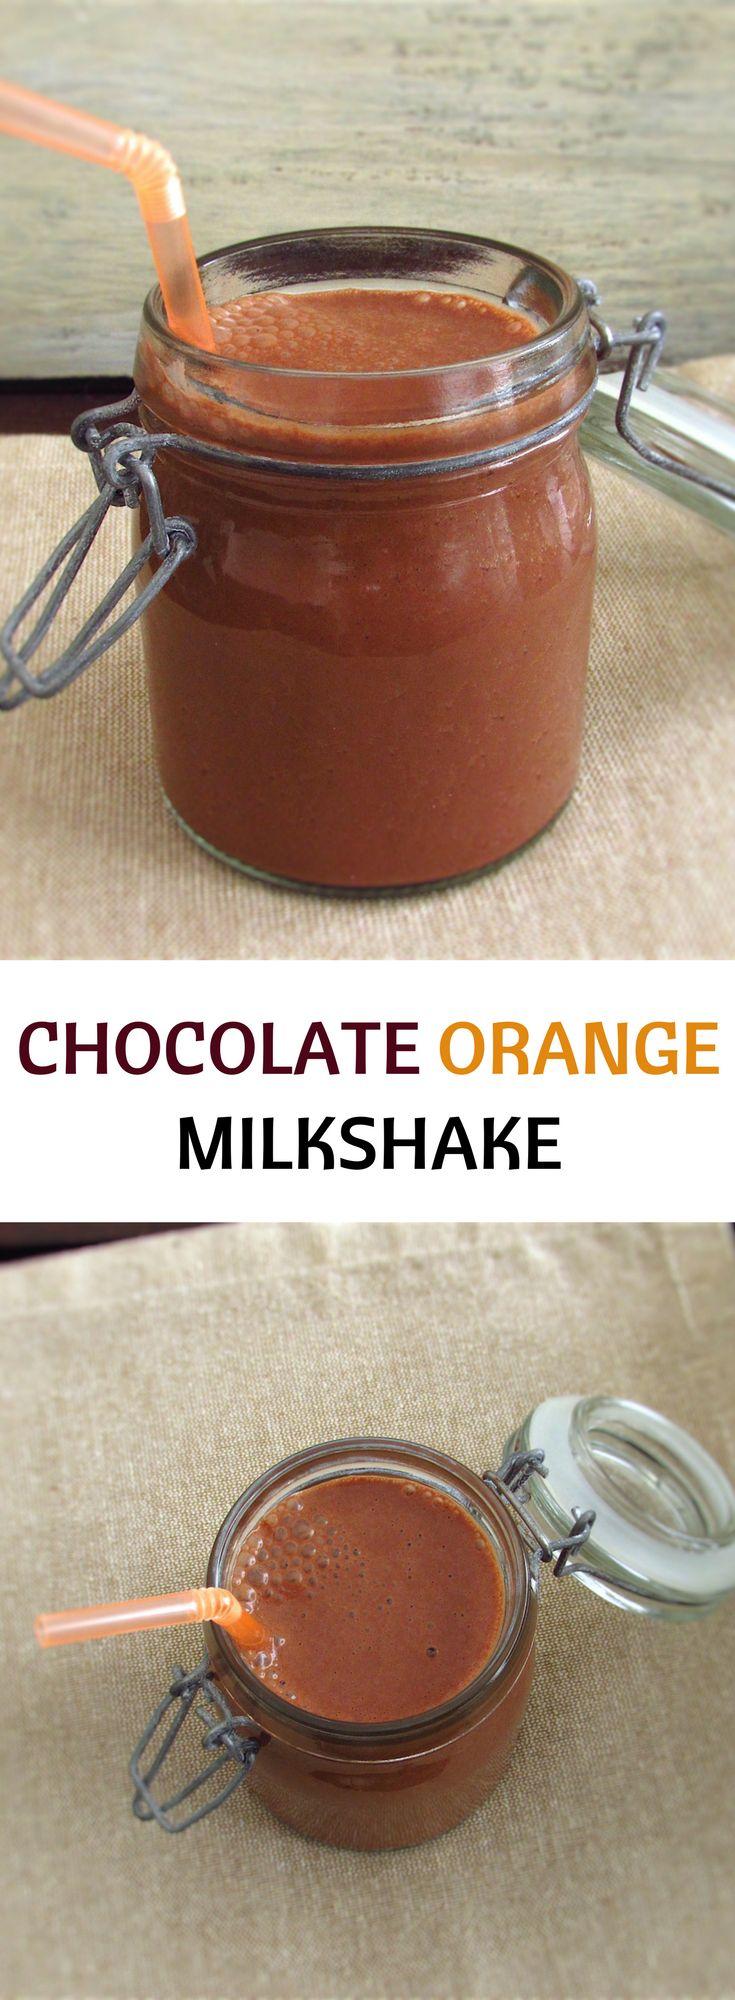 Chocolate orange milkshake   Food From Portugal. This chocolate orange milkshake is an excellent choice on a hot summer afternoon! Quick, simple, delicious and quite refreshing... #milkshake #recipe #chocolate #orange